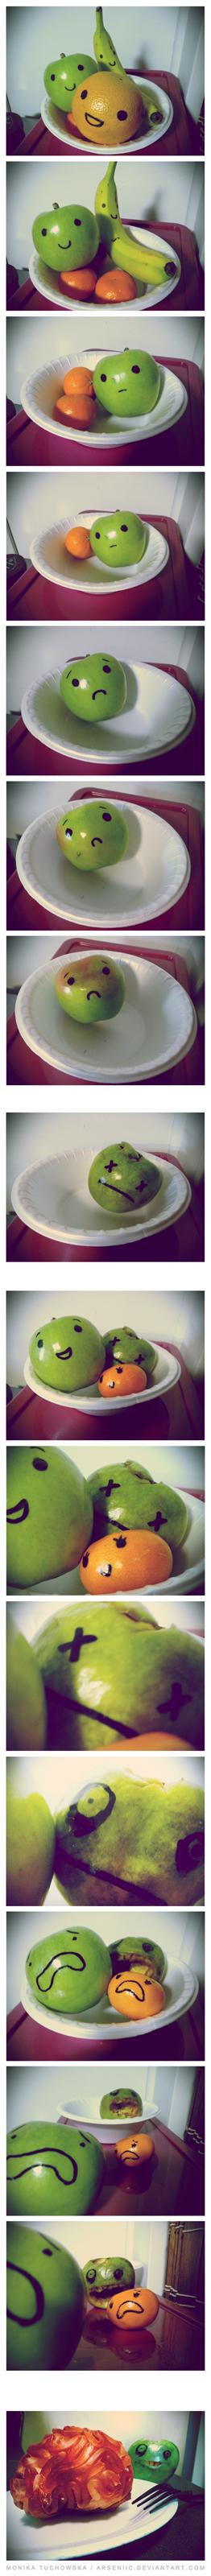 brains zombie apocalypse apple fruit - 6852802560